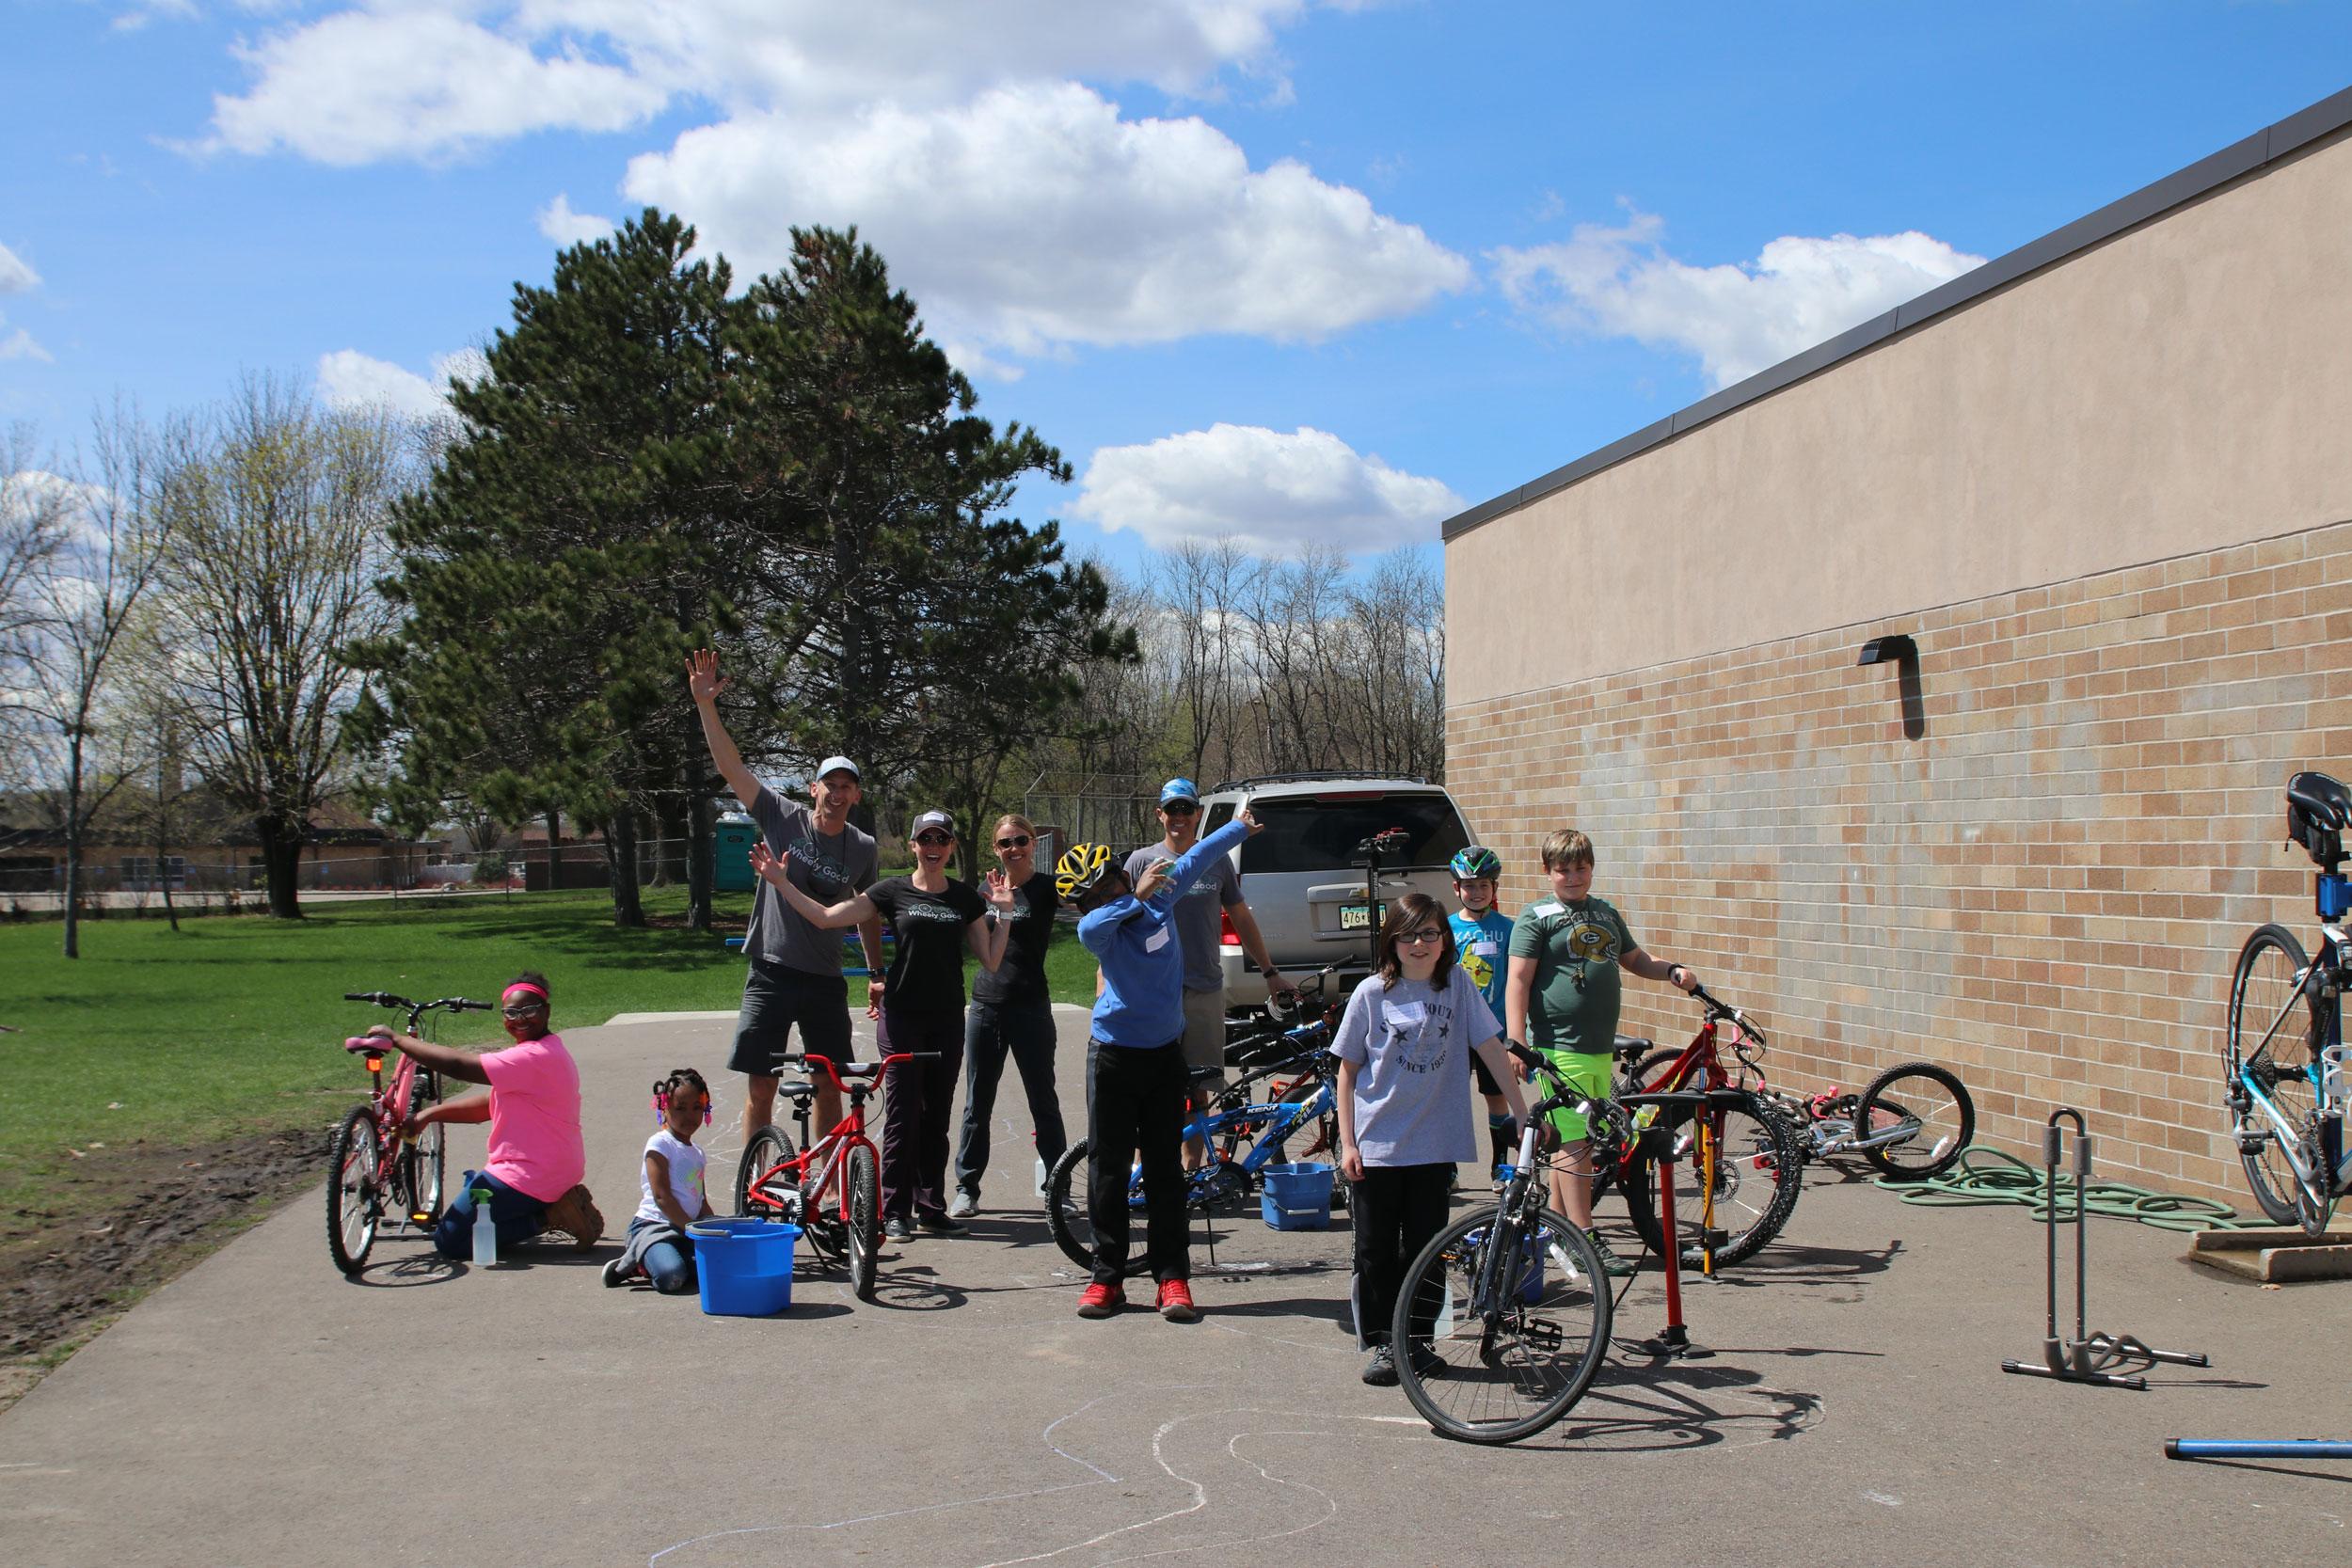 Kids College, Wheely Good Bike Shop, Birchview Elementary